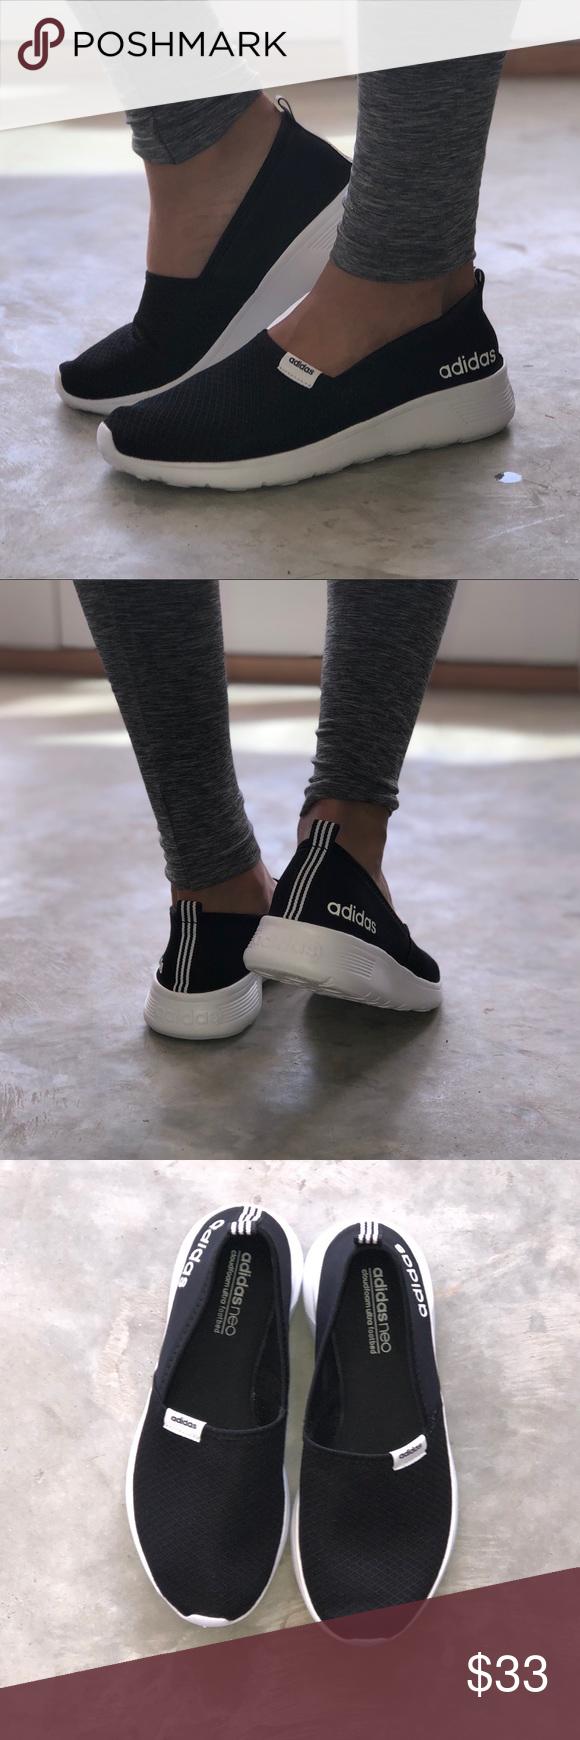 Adidas Neo Cloudfoam Lite Racer Slip-On